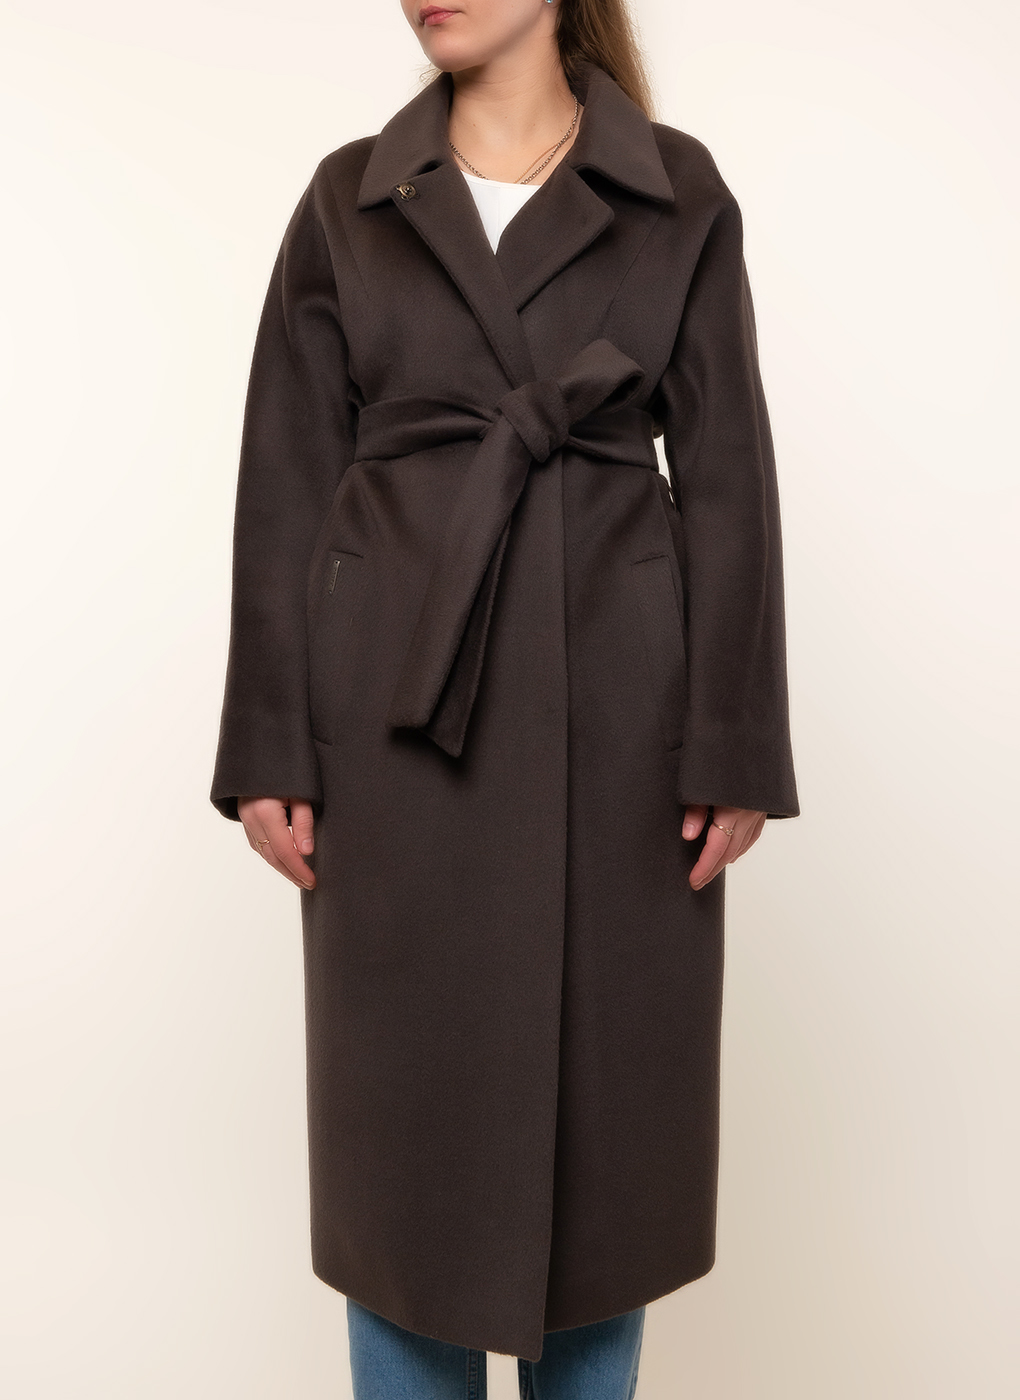 Пальто прямое шерстяное 65, idekka фото